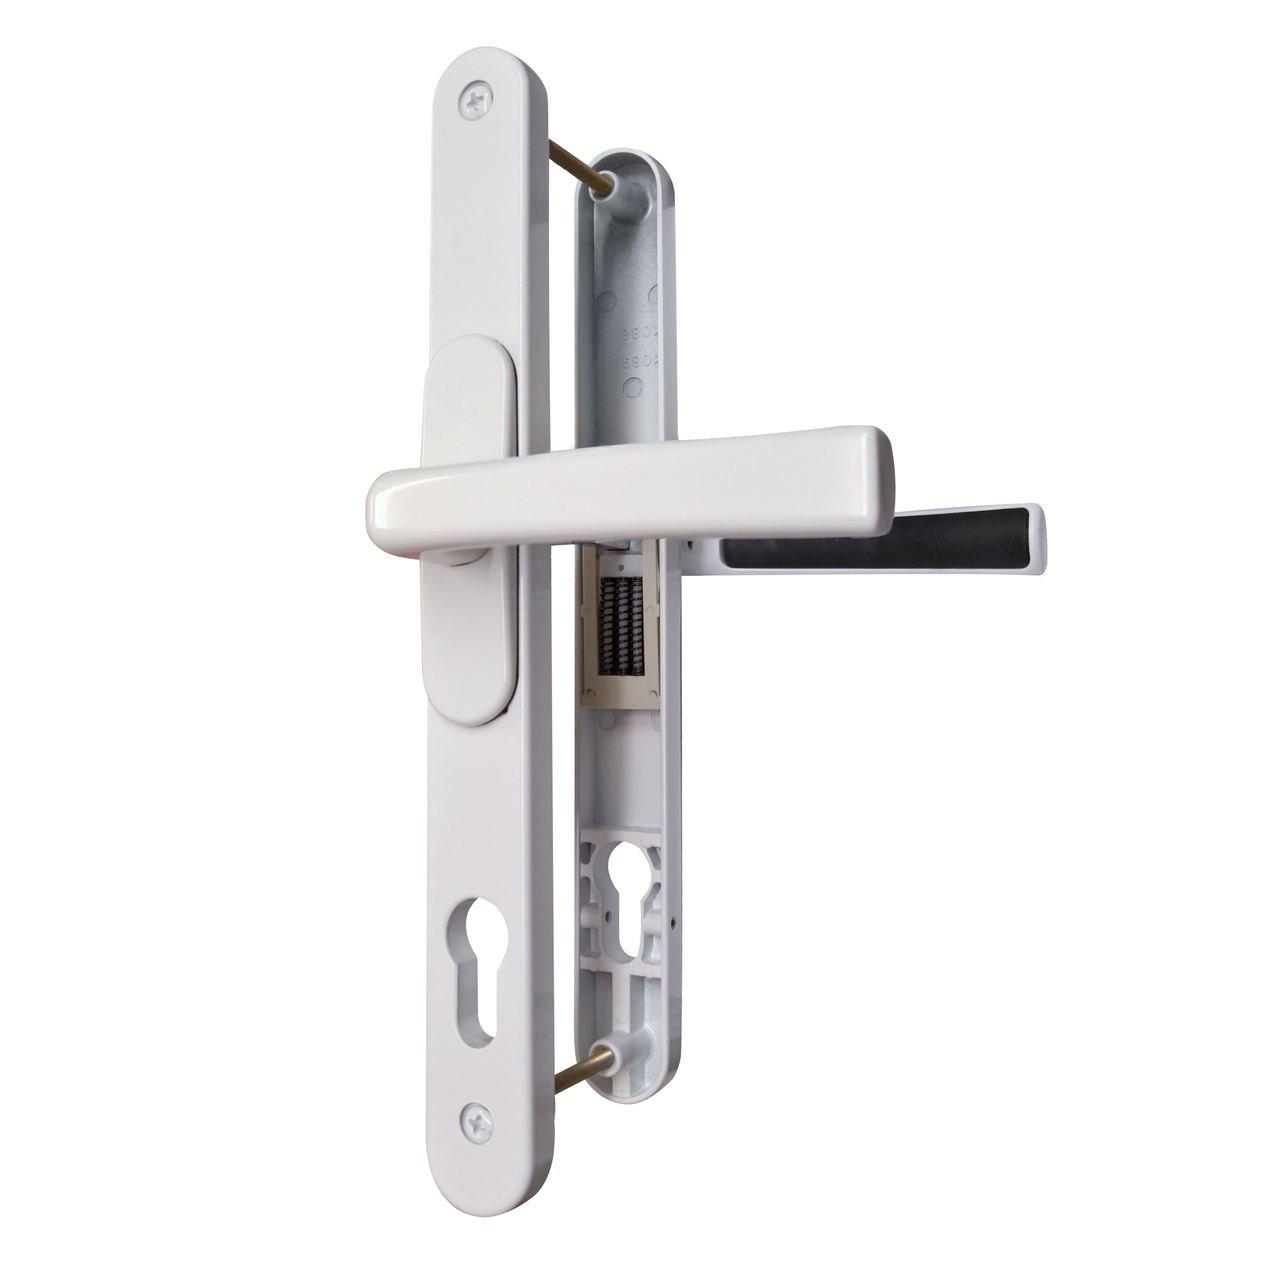 VERSA Universal uPVC Door Handles. Adjustable PZ (Polished Chrome)